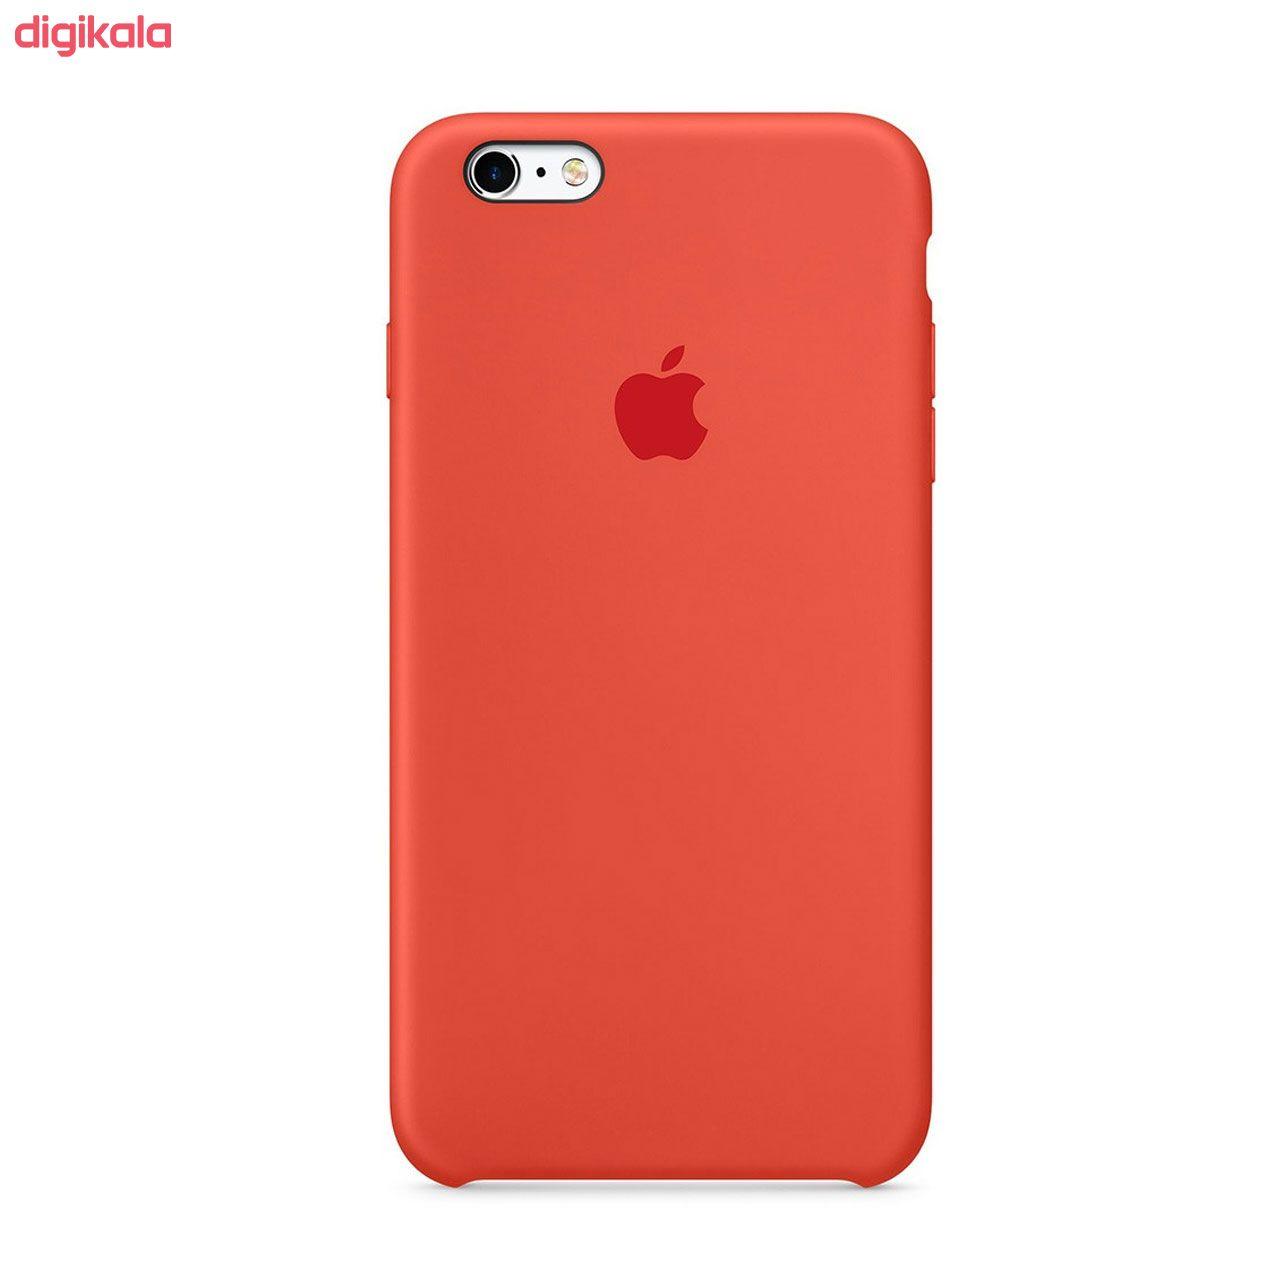 کاور مدل SLCN مناسب برای گوشی موبایل اپل iPhone 7 main 1 12